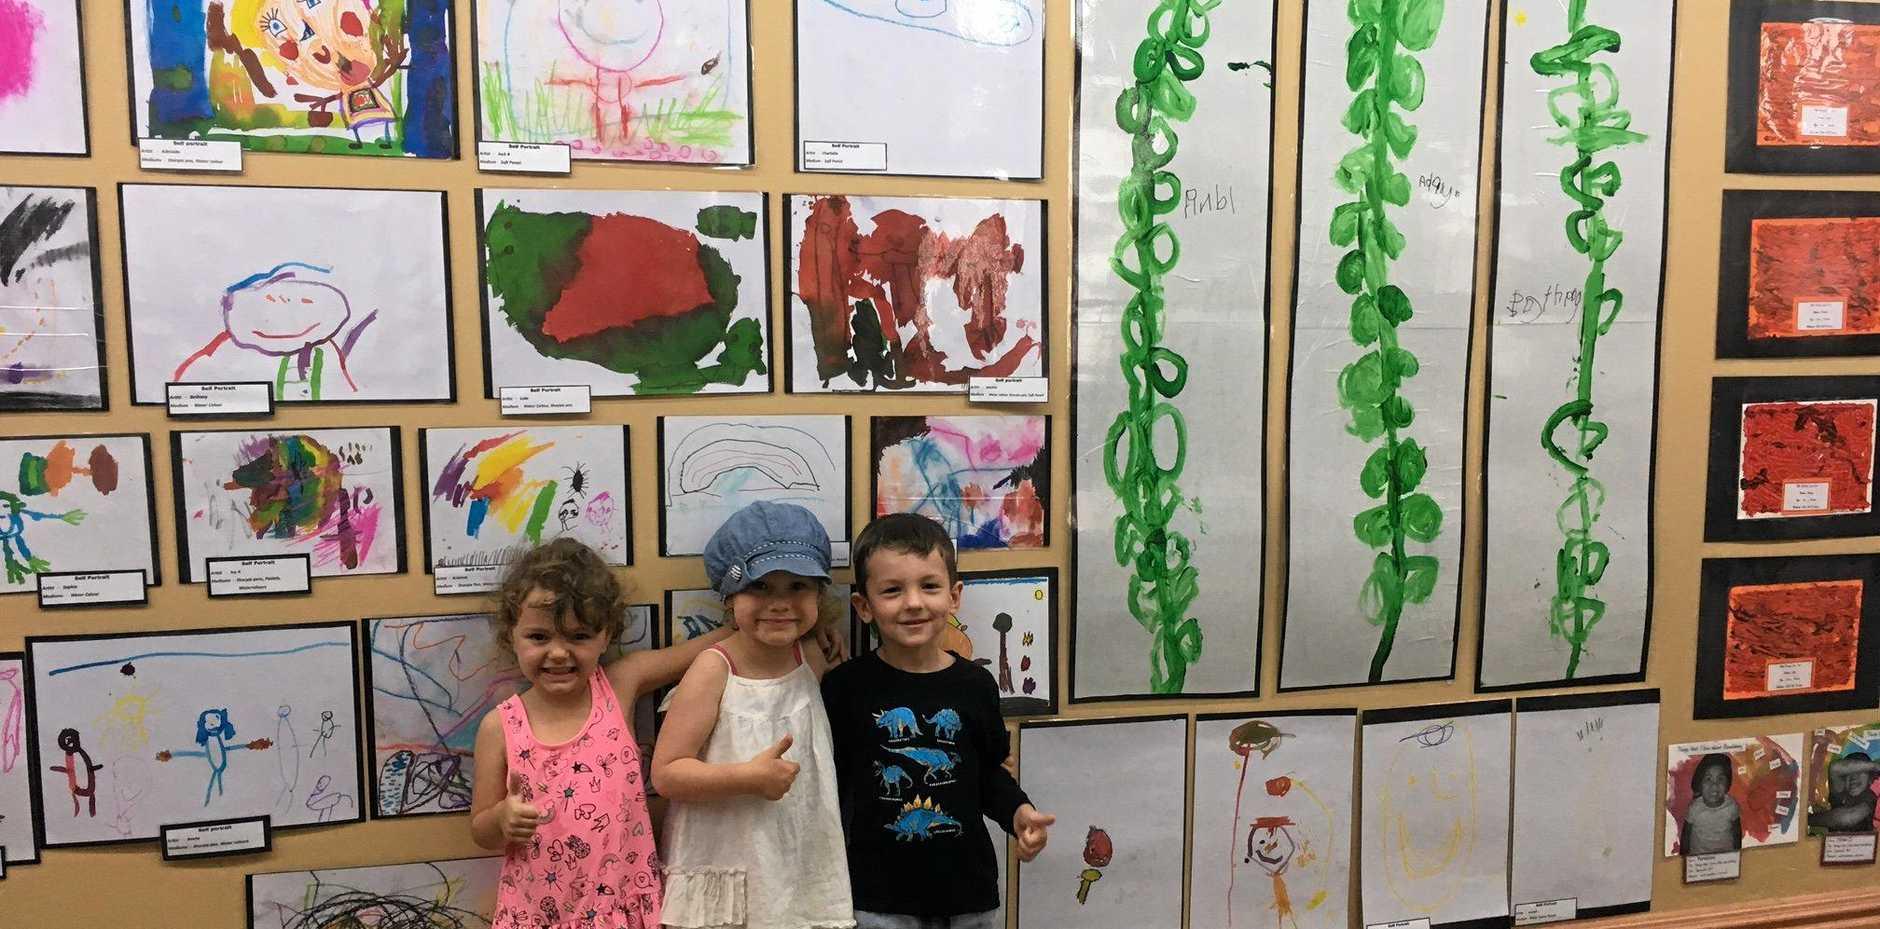 ALL SMILES: 300 kindergarten children in Bundaberg will have their art work on display at the School of Arts building.